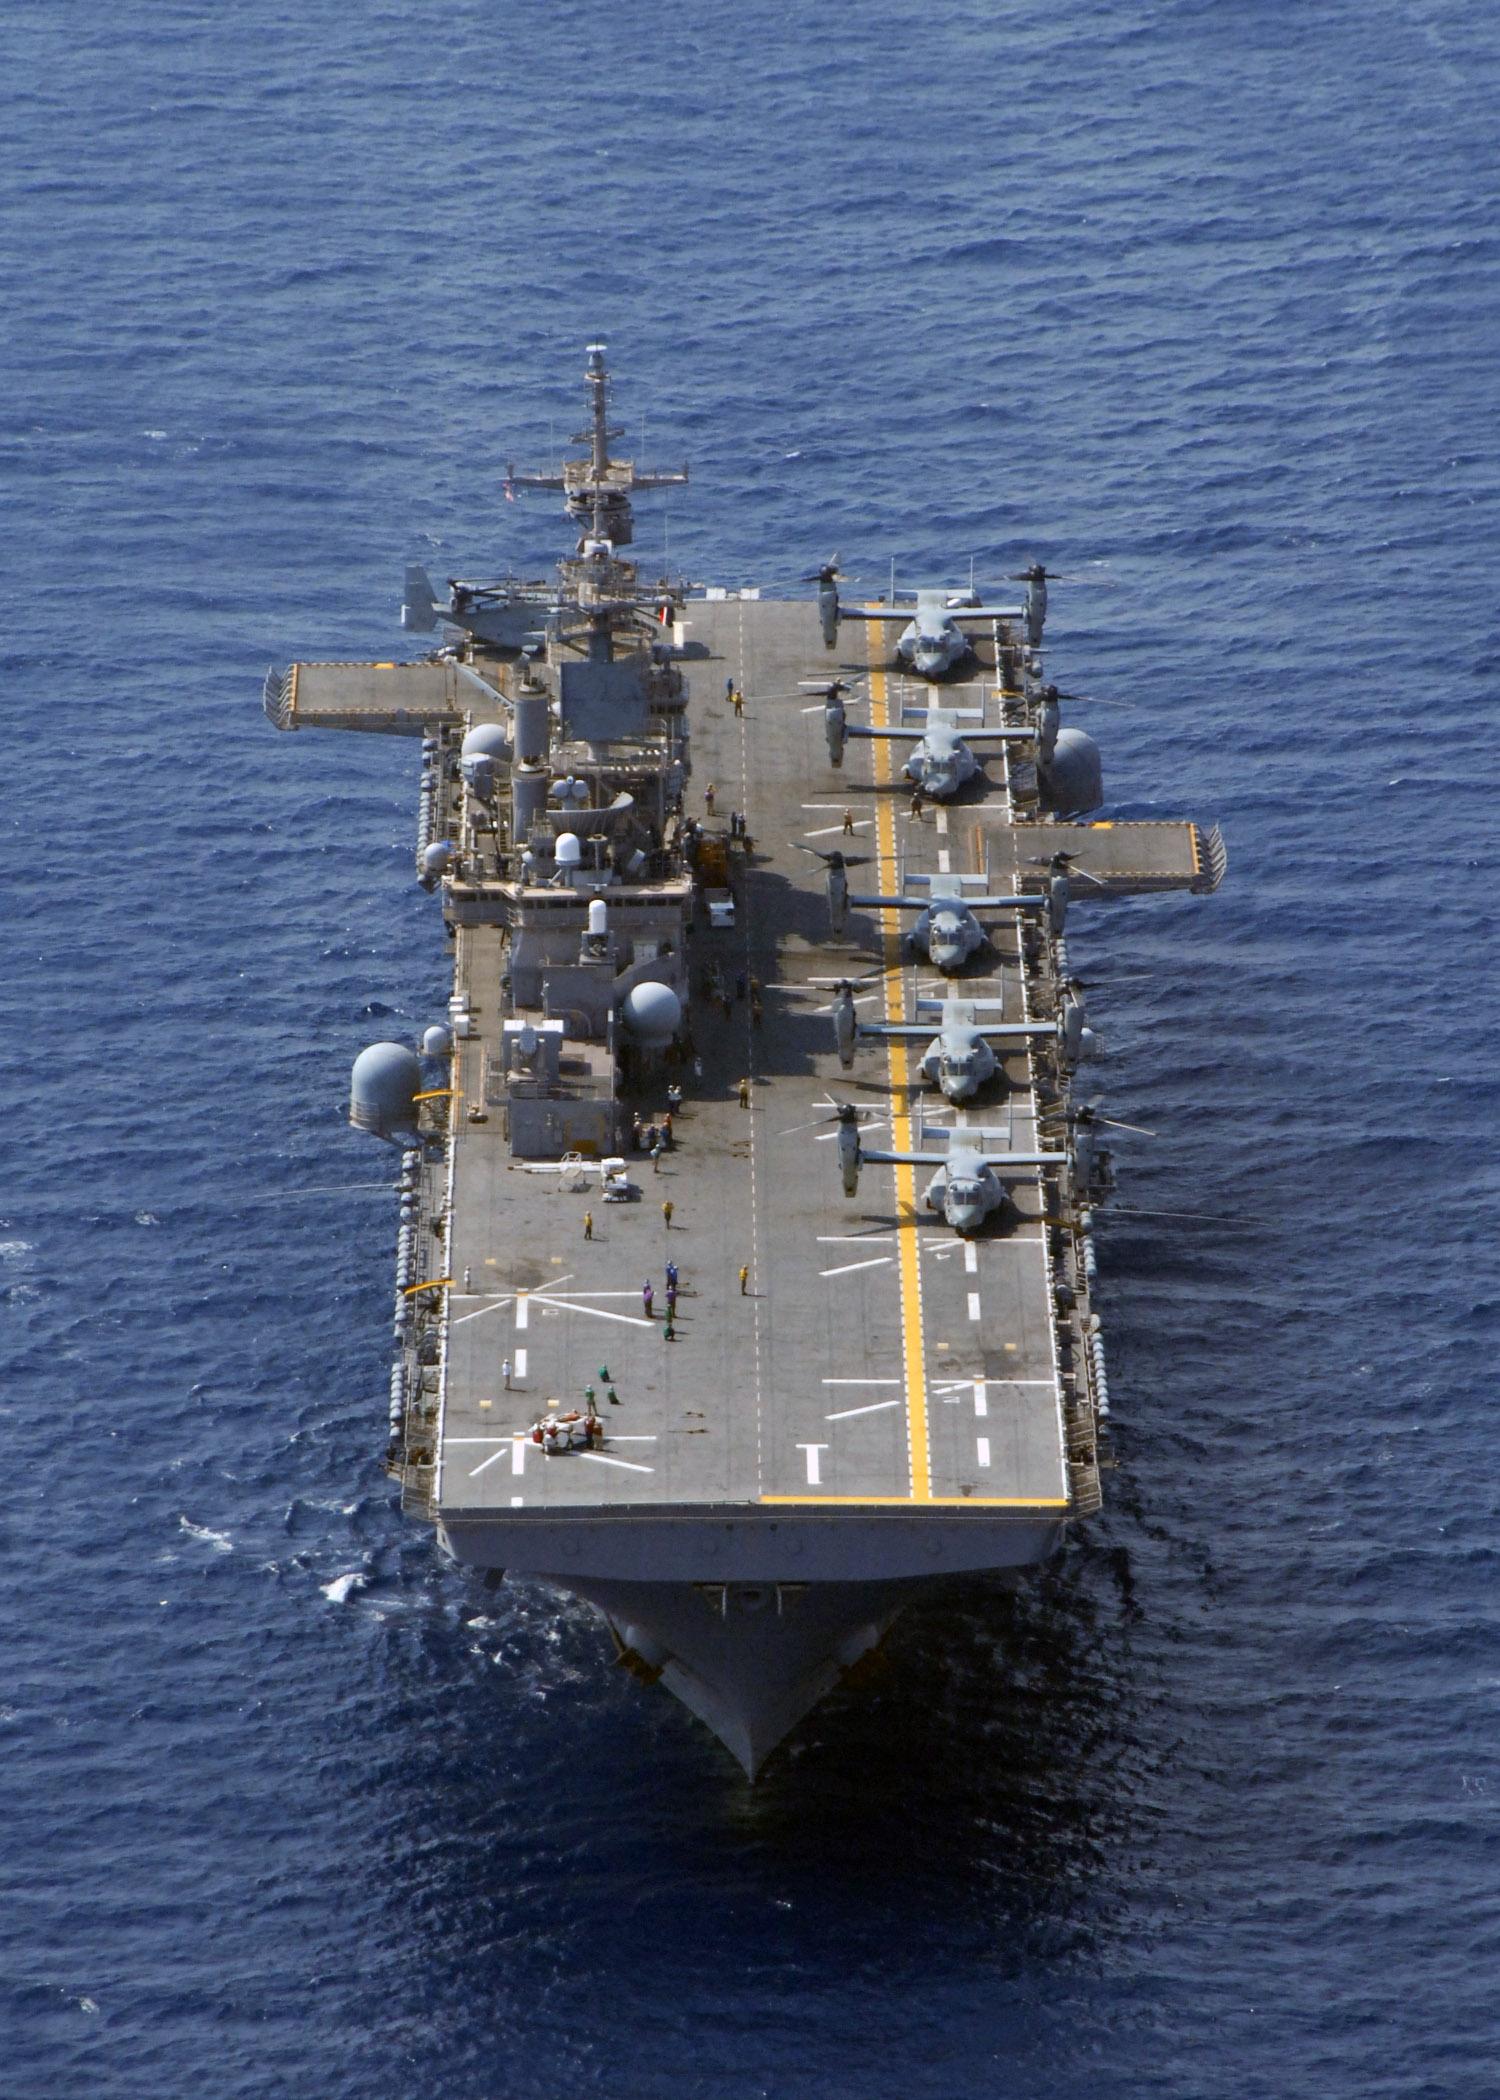 File:USS Wasp (LHD-1) Osprey.jpg - Wikimedia Commons